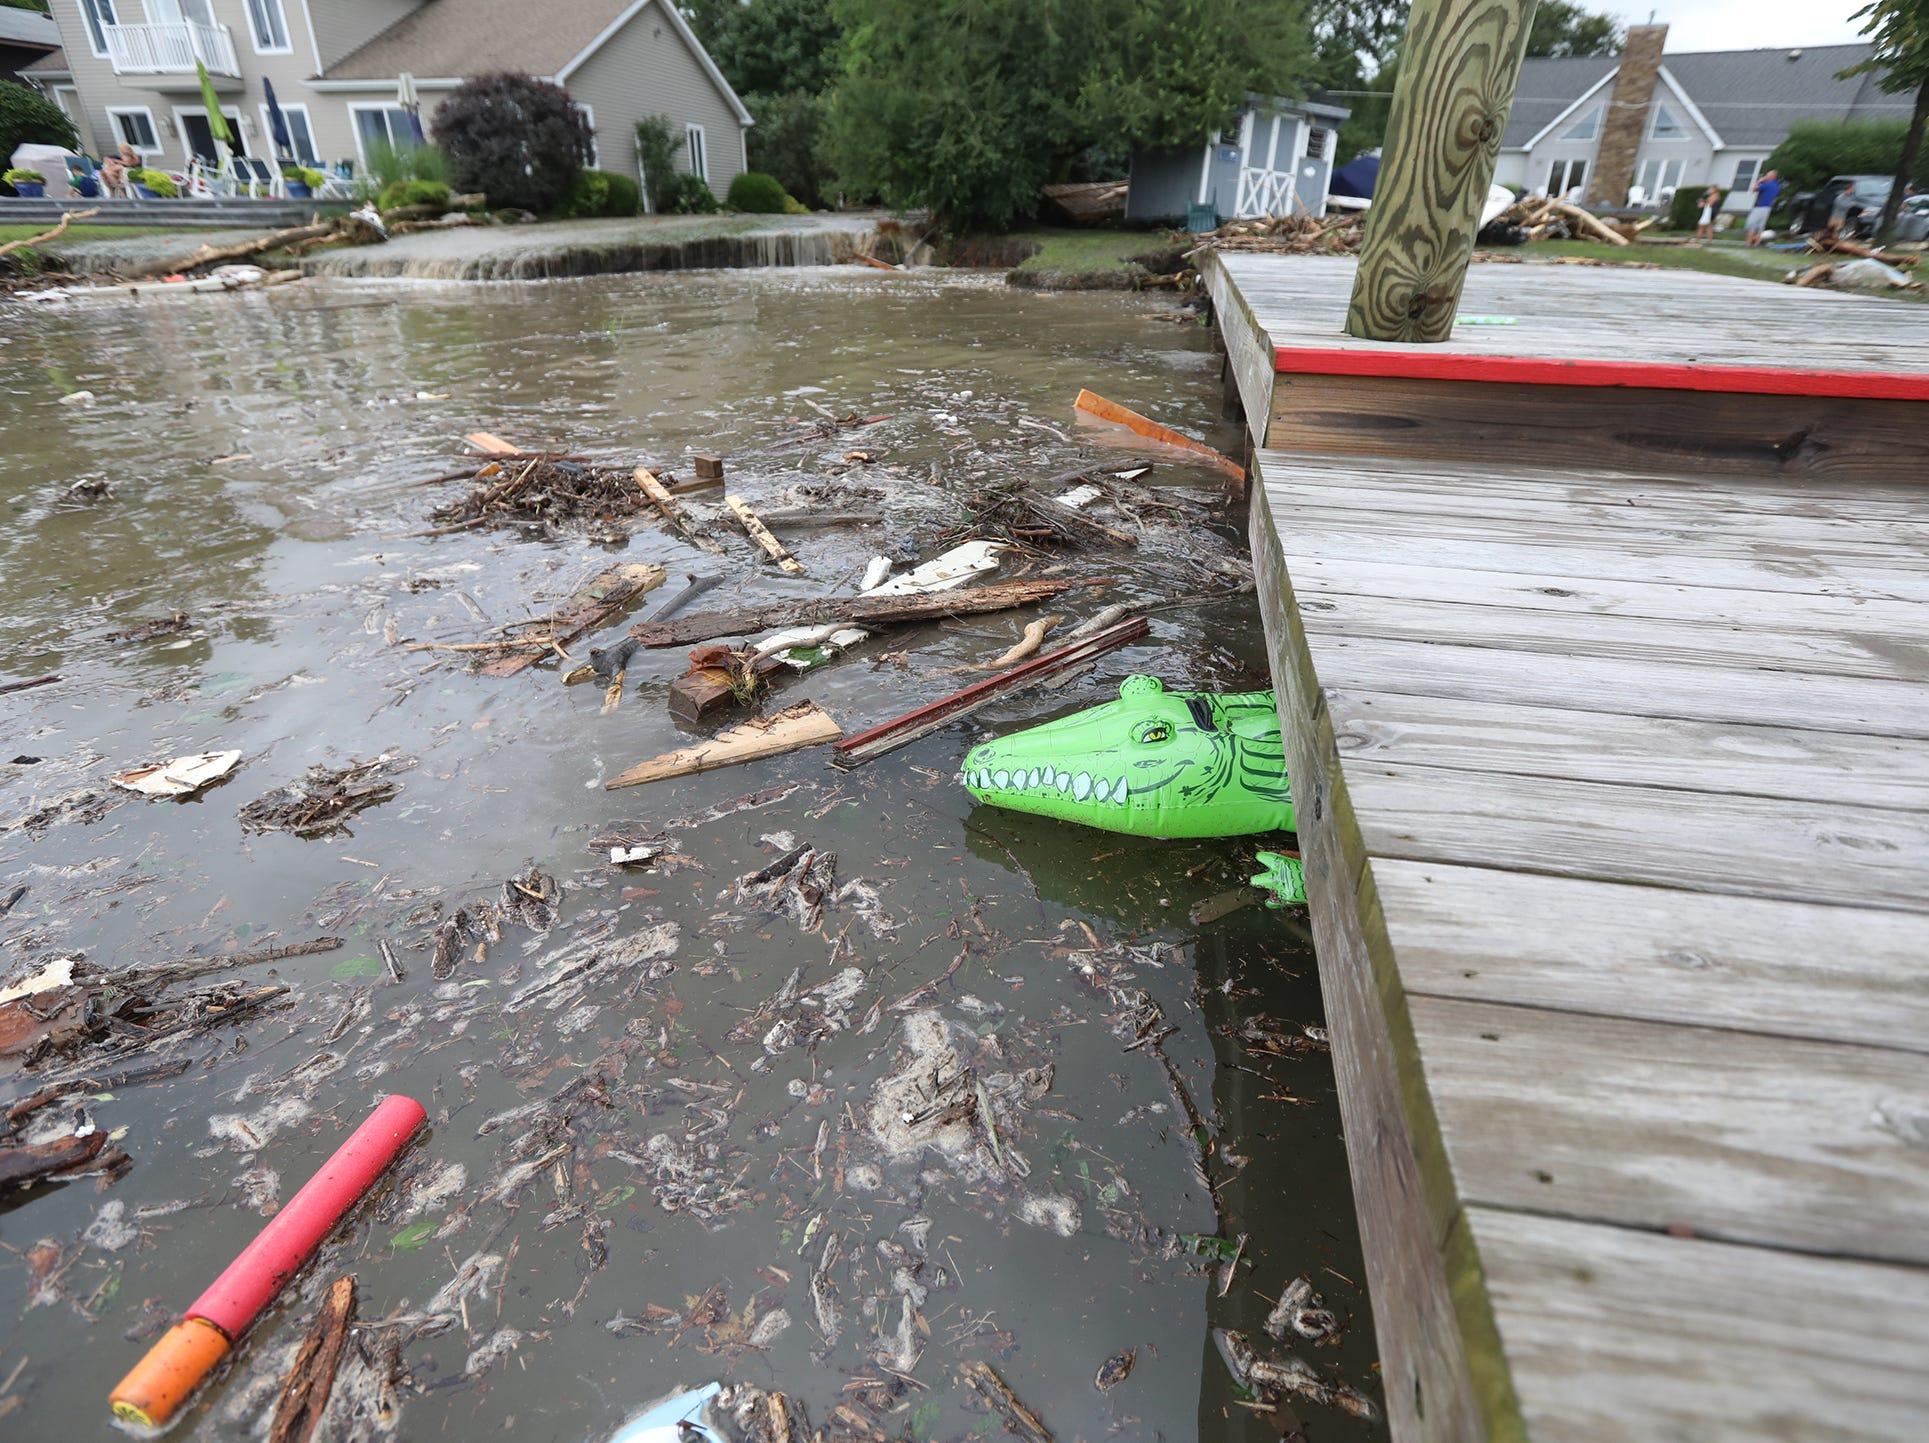 Some of people's possessions and debris were jammed under docks along Seneca Lake.